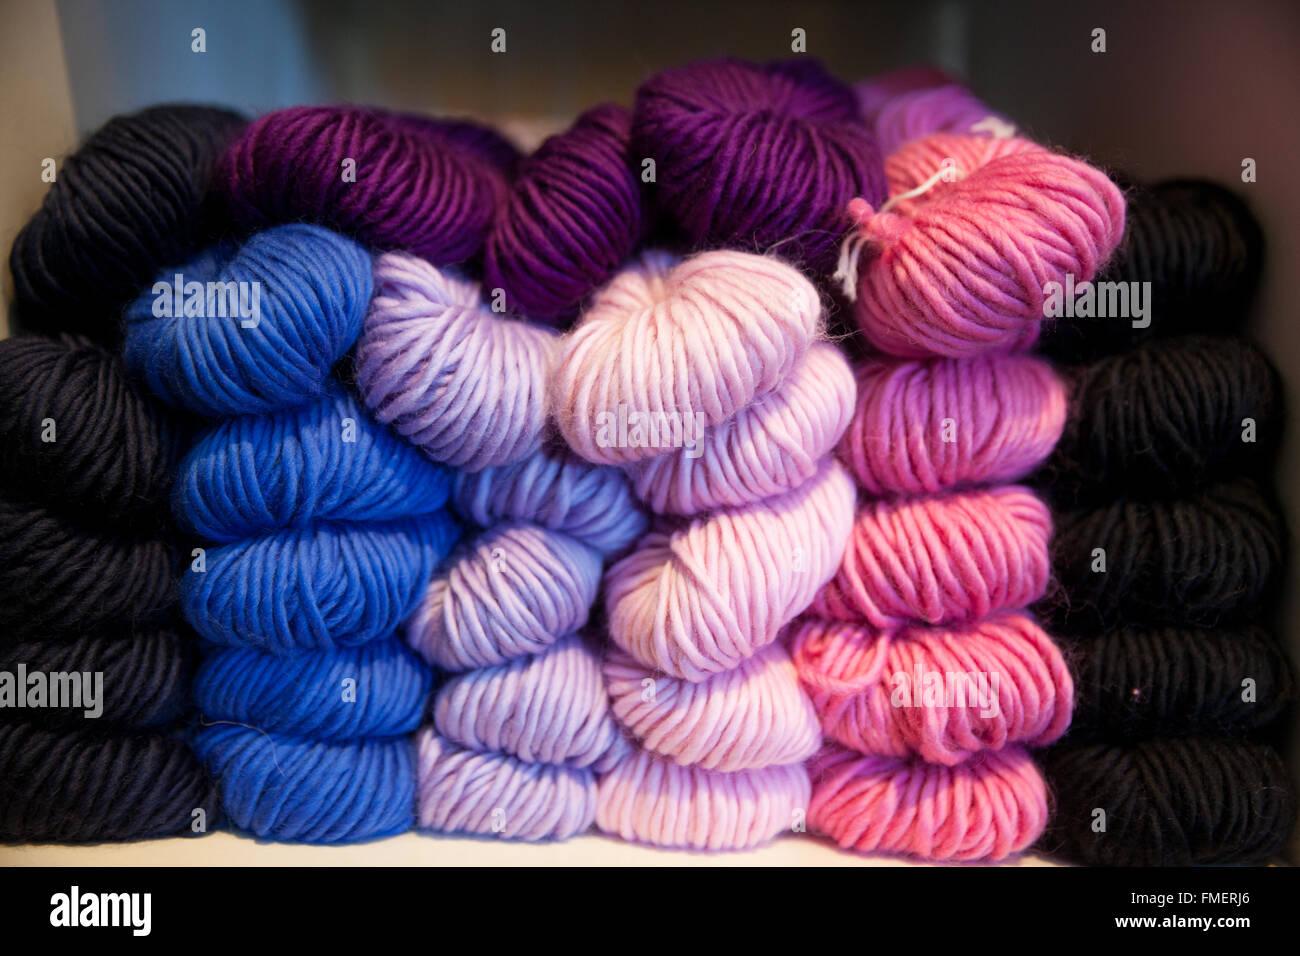 Colorful skeins of yarn on display. - Stock Image